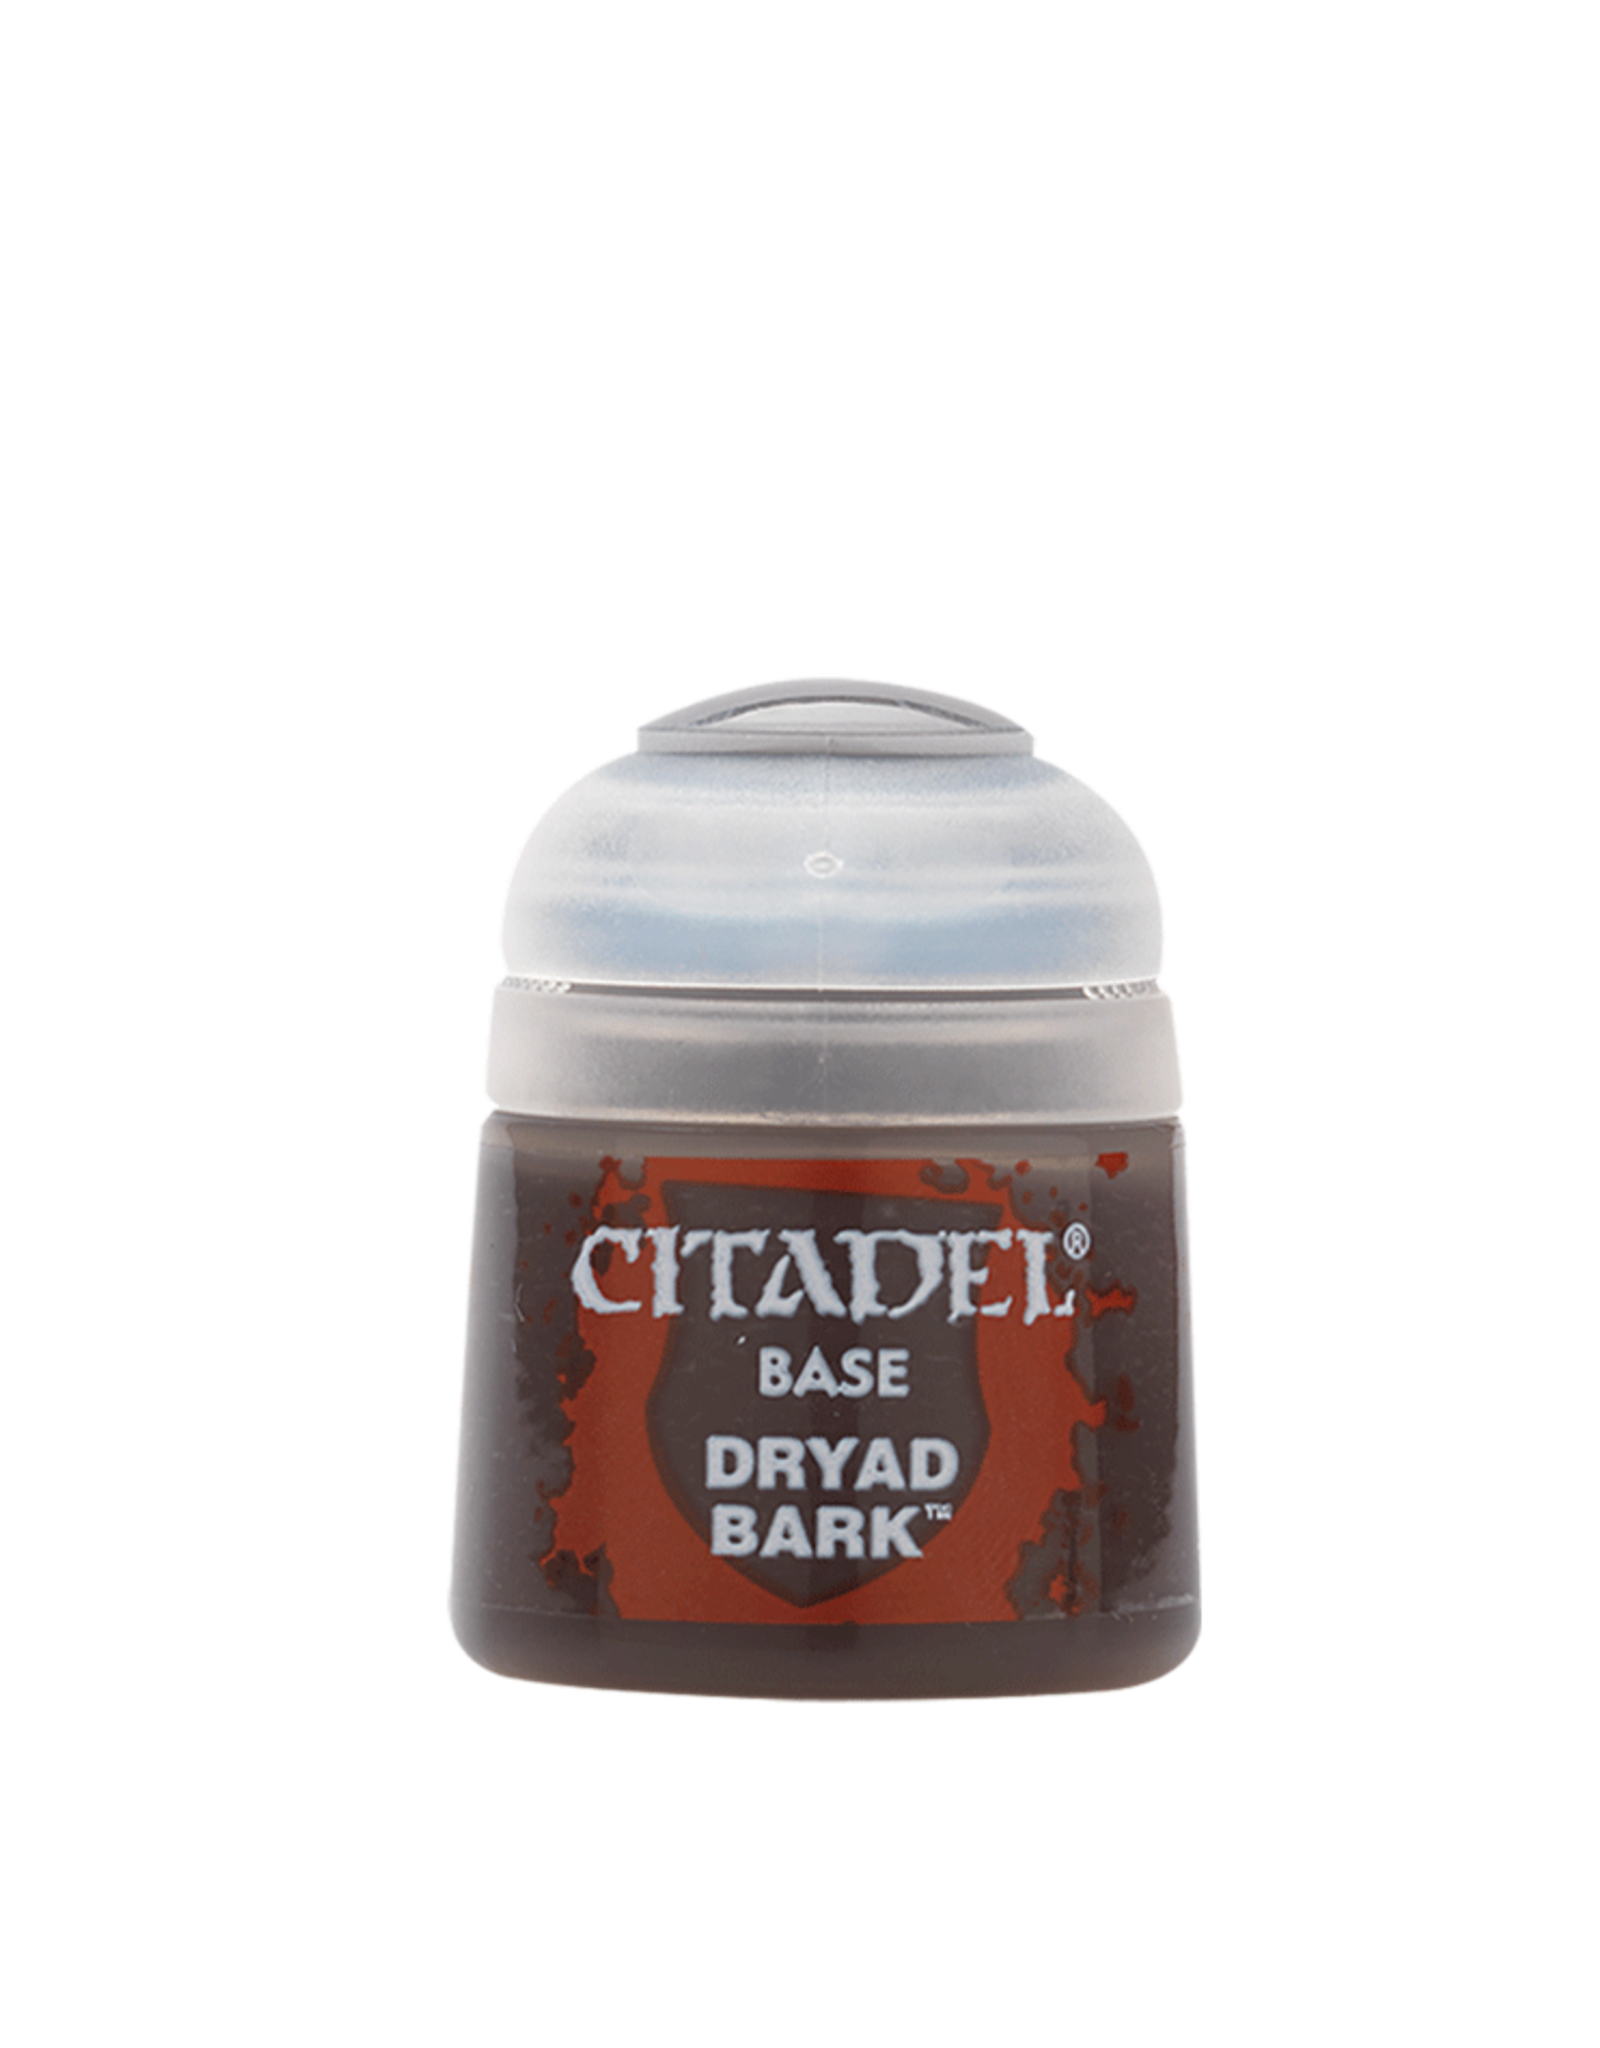 Citadel Citadel Base: Dryad Bark (12ml)